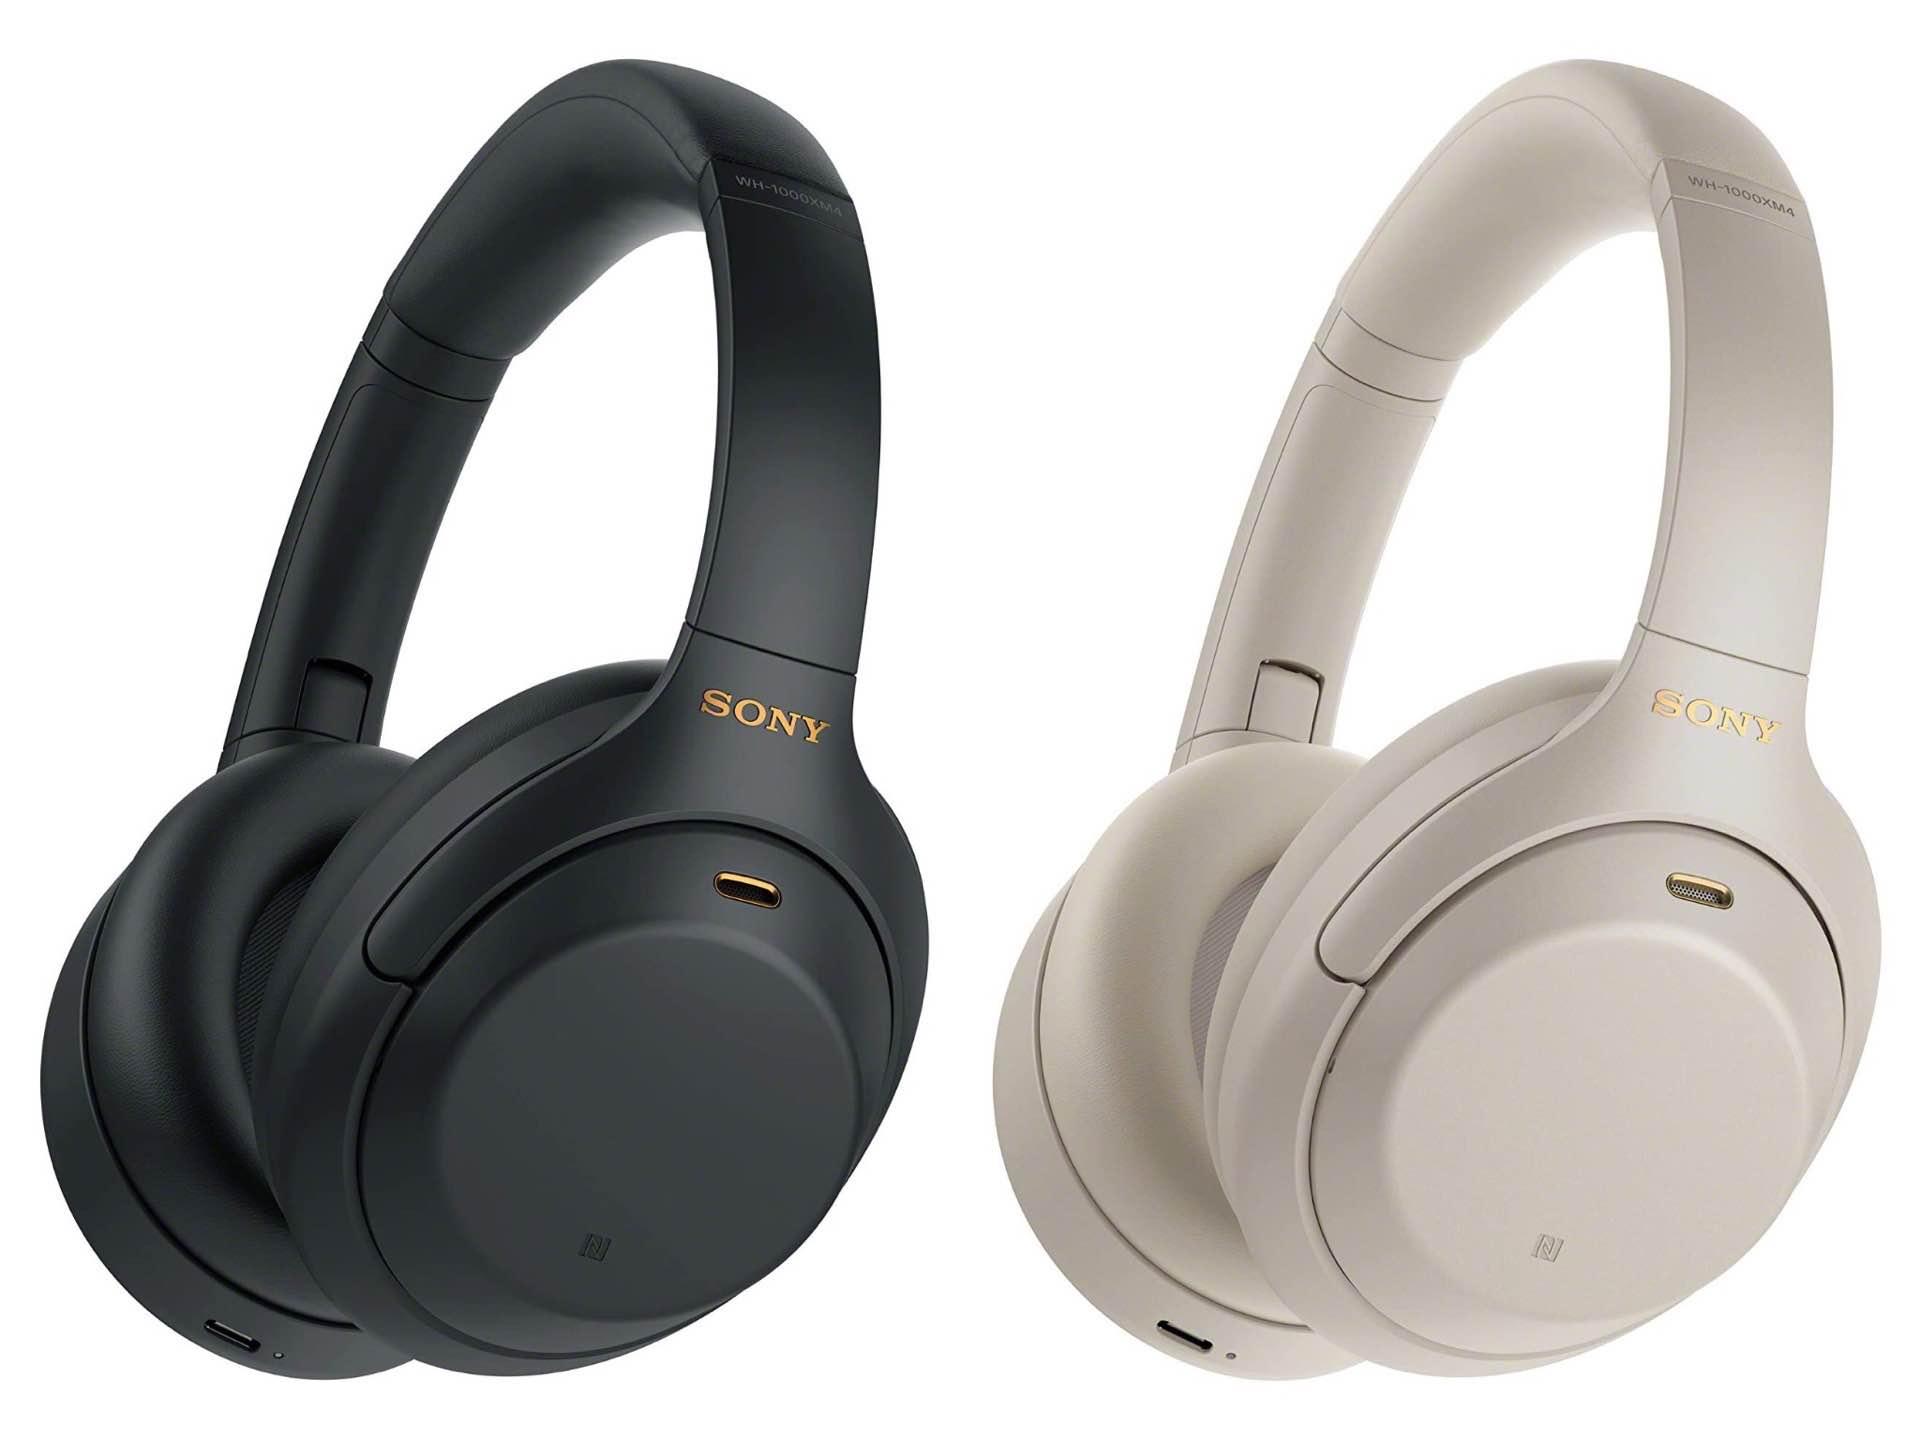 sony-wh-1000xm4-noise-canceling-wireless-headphones